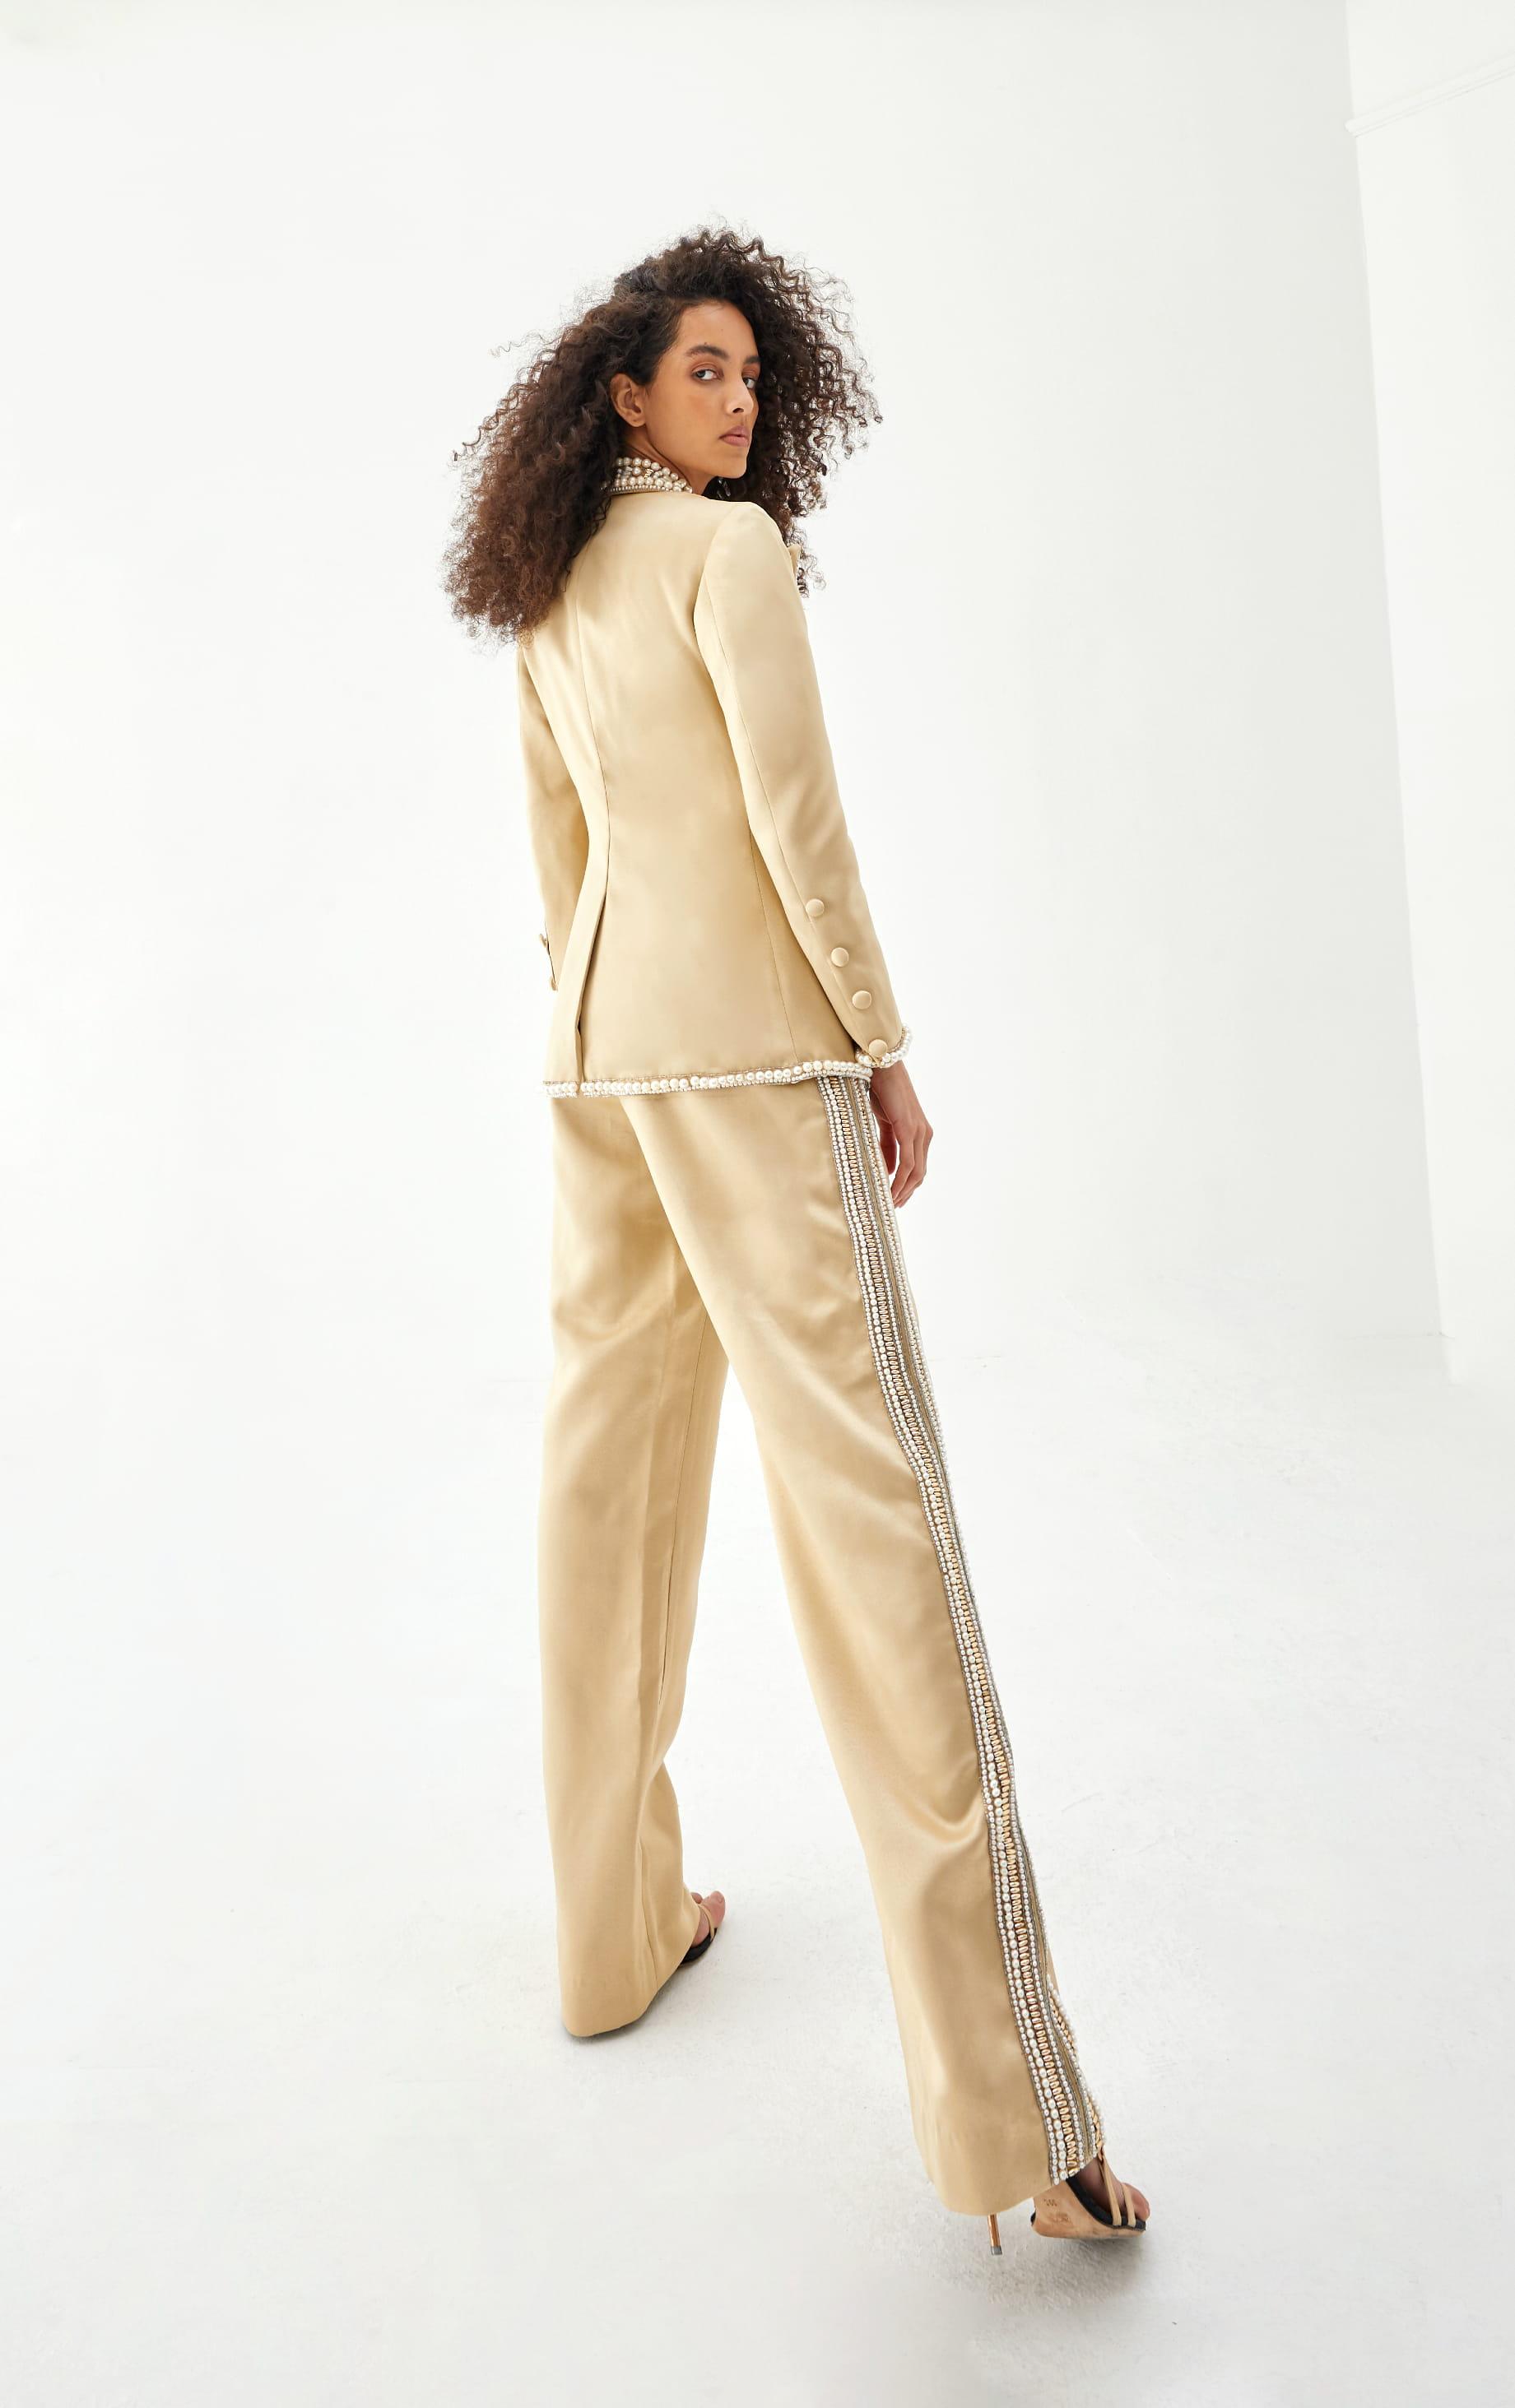 View 4 of model wearing Kismah Blazer in sand gold.